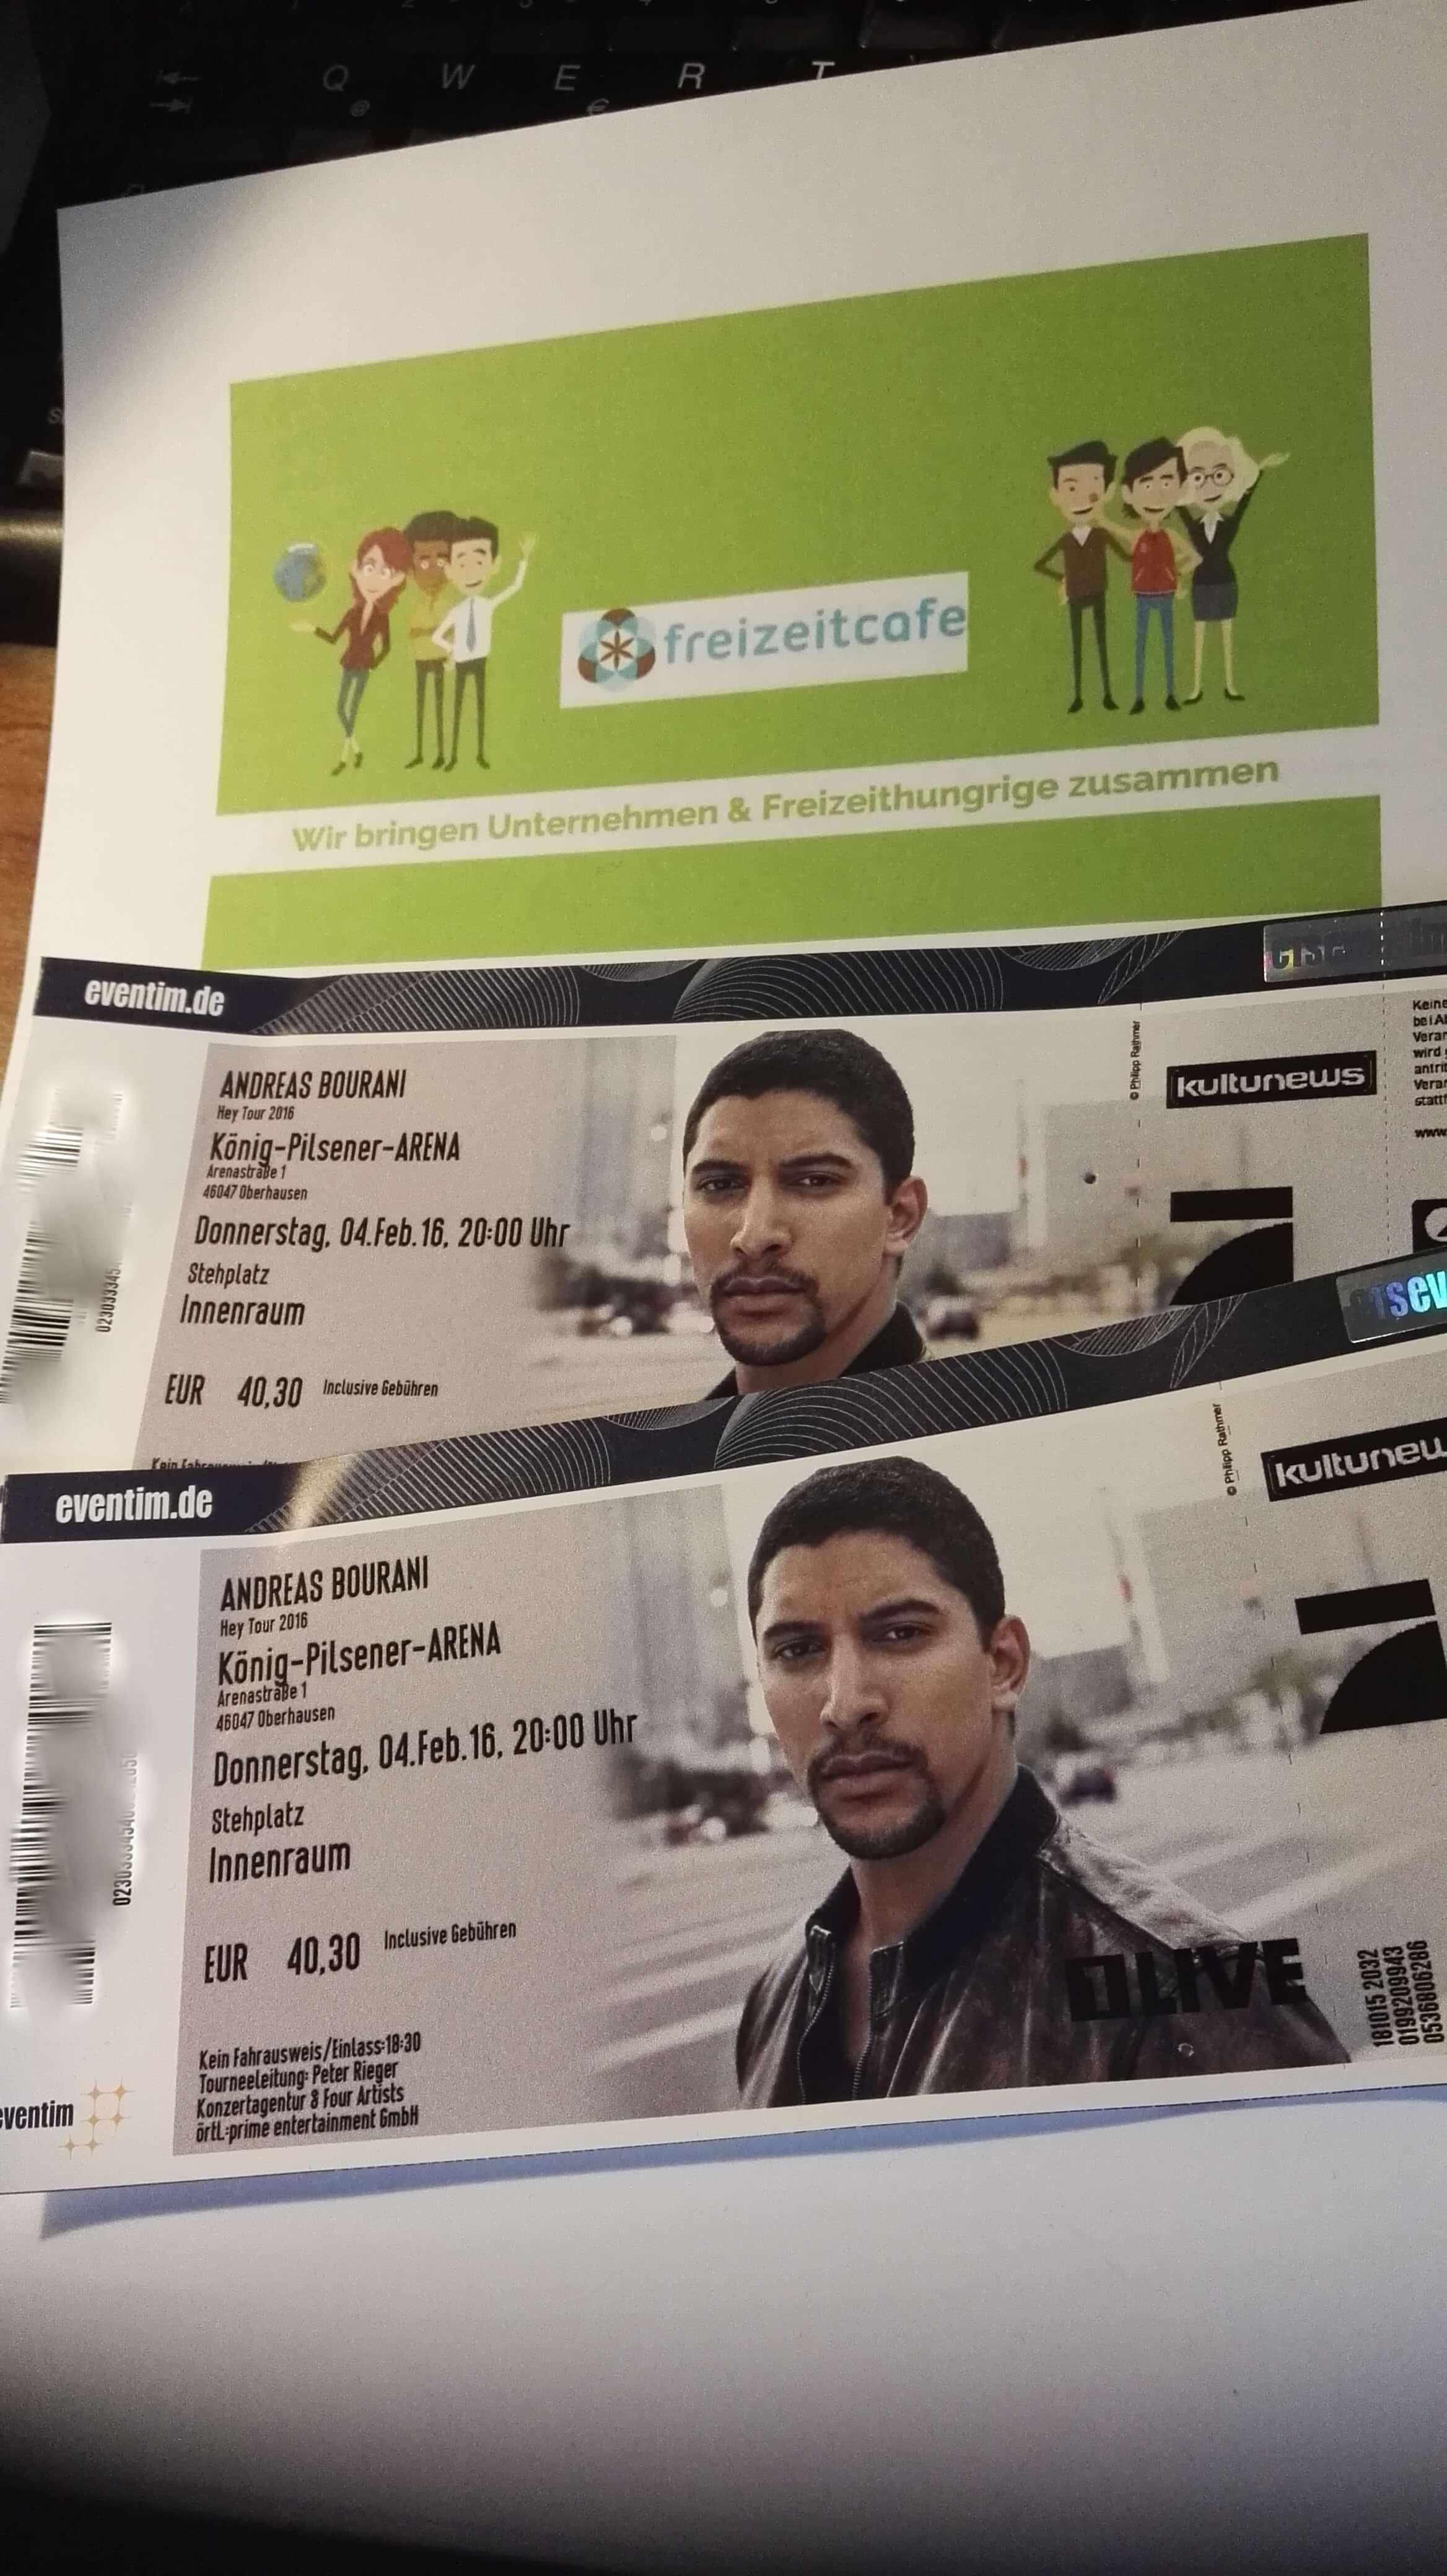 2x Andreas Bourani Tickets 20h Oberhausen zu verlosen!